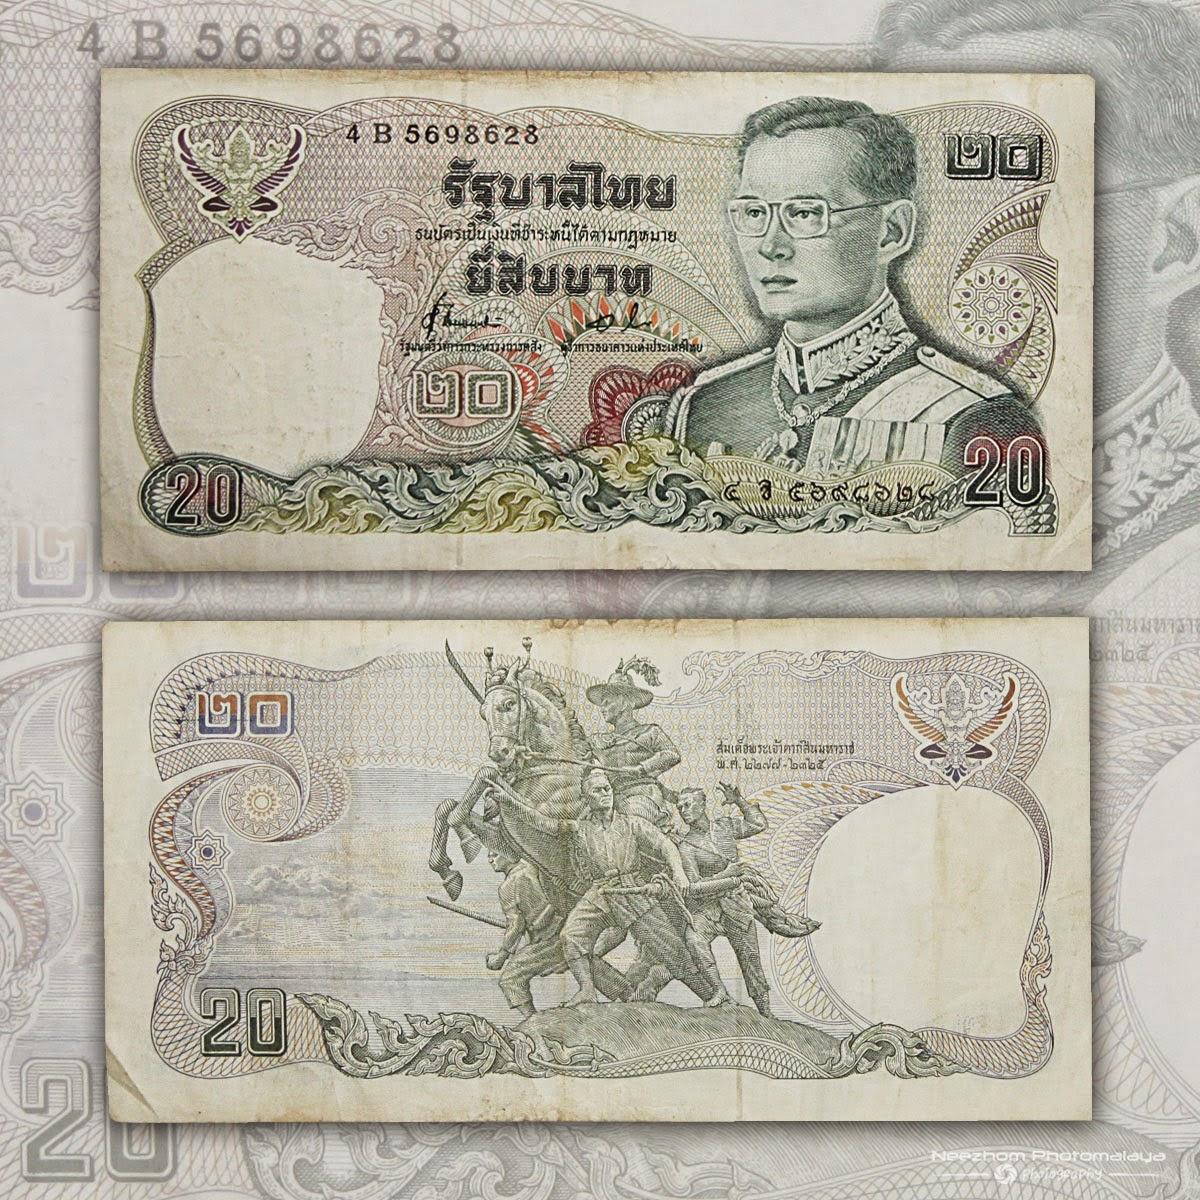 Thailand banknote 20 Baht 1981